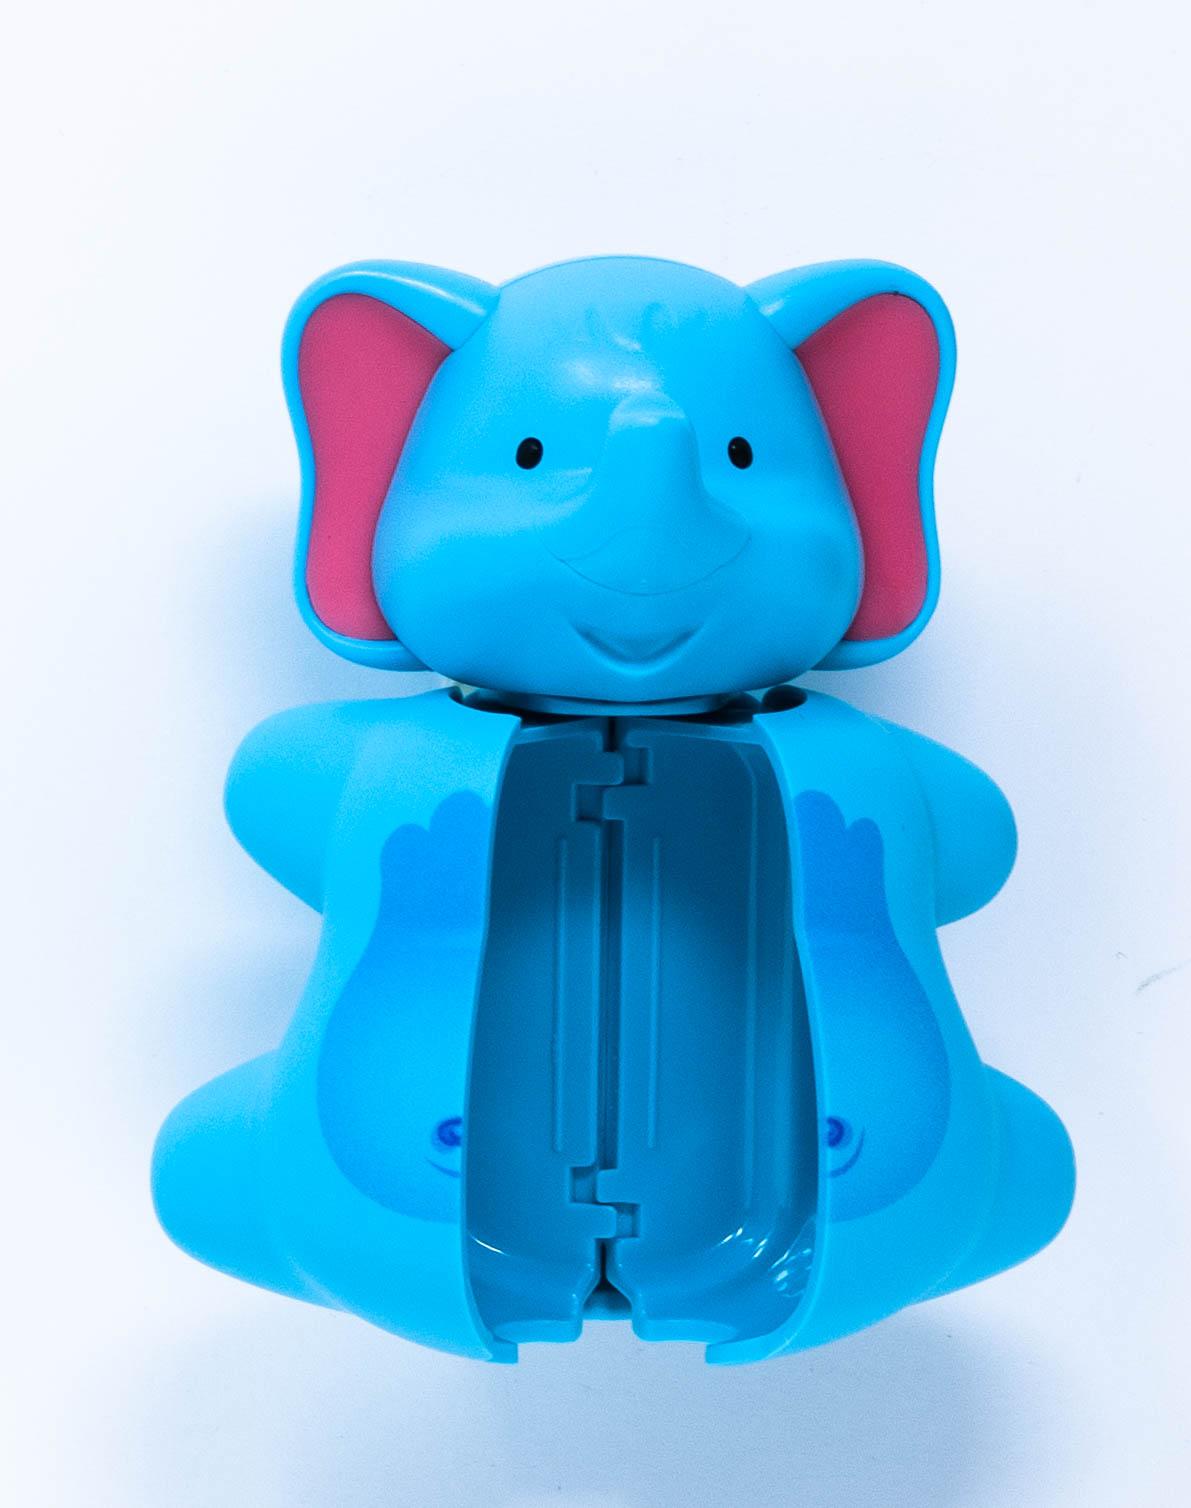 Miradent Porta Spazzolino Elefante - 1 pz